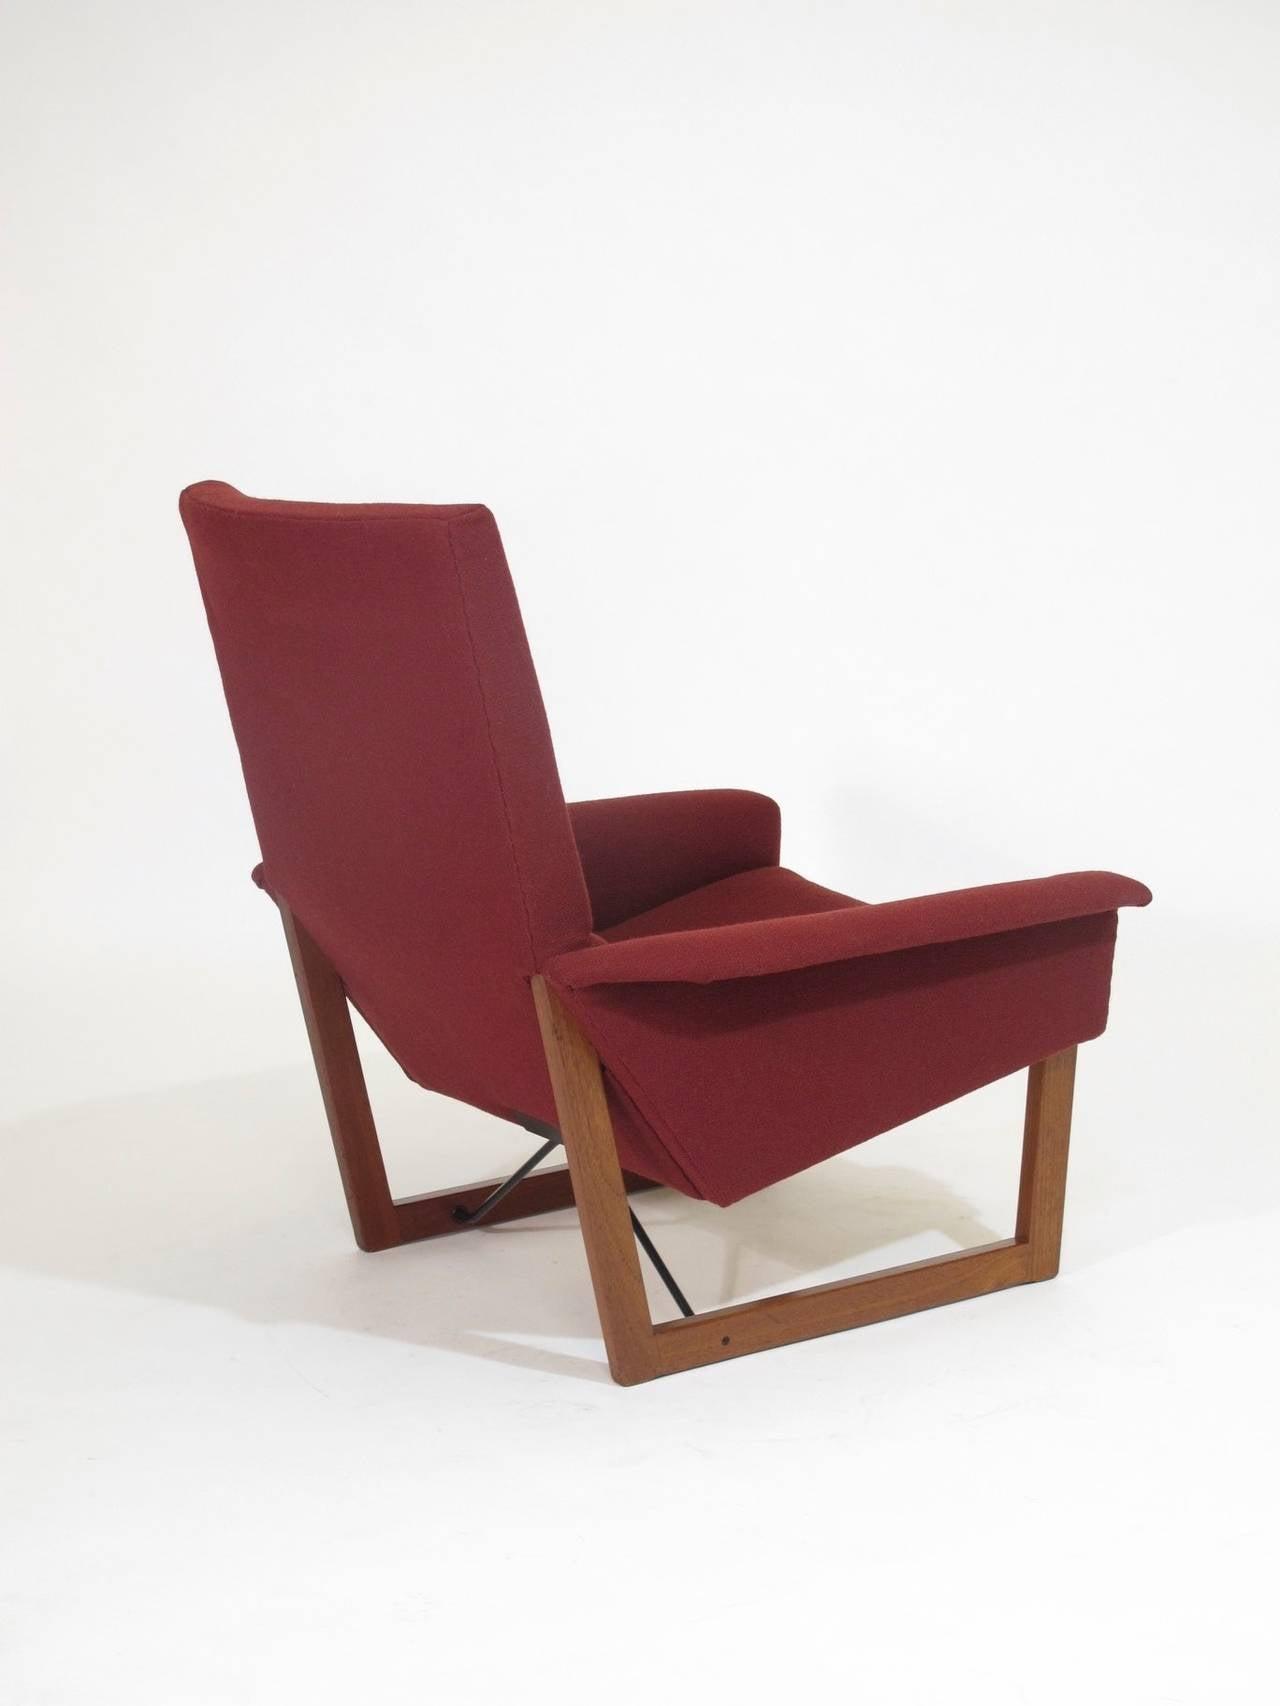 Illum Wikkelso Danish Lounge Chair at 1stdibs